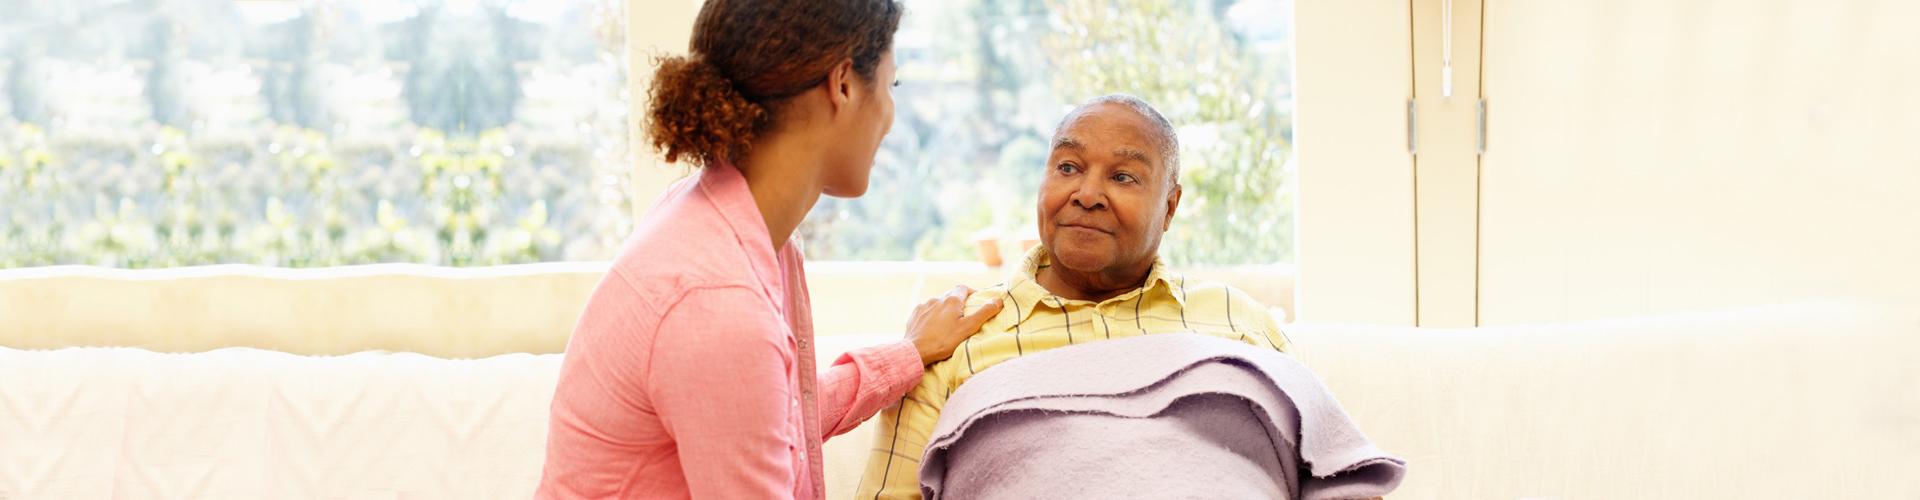 a caregiver and a senior man talking